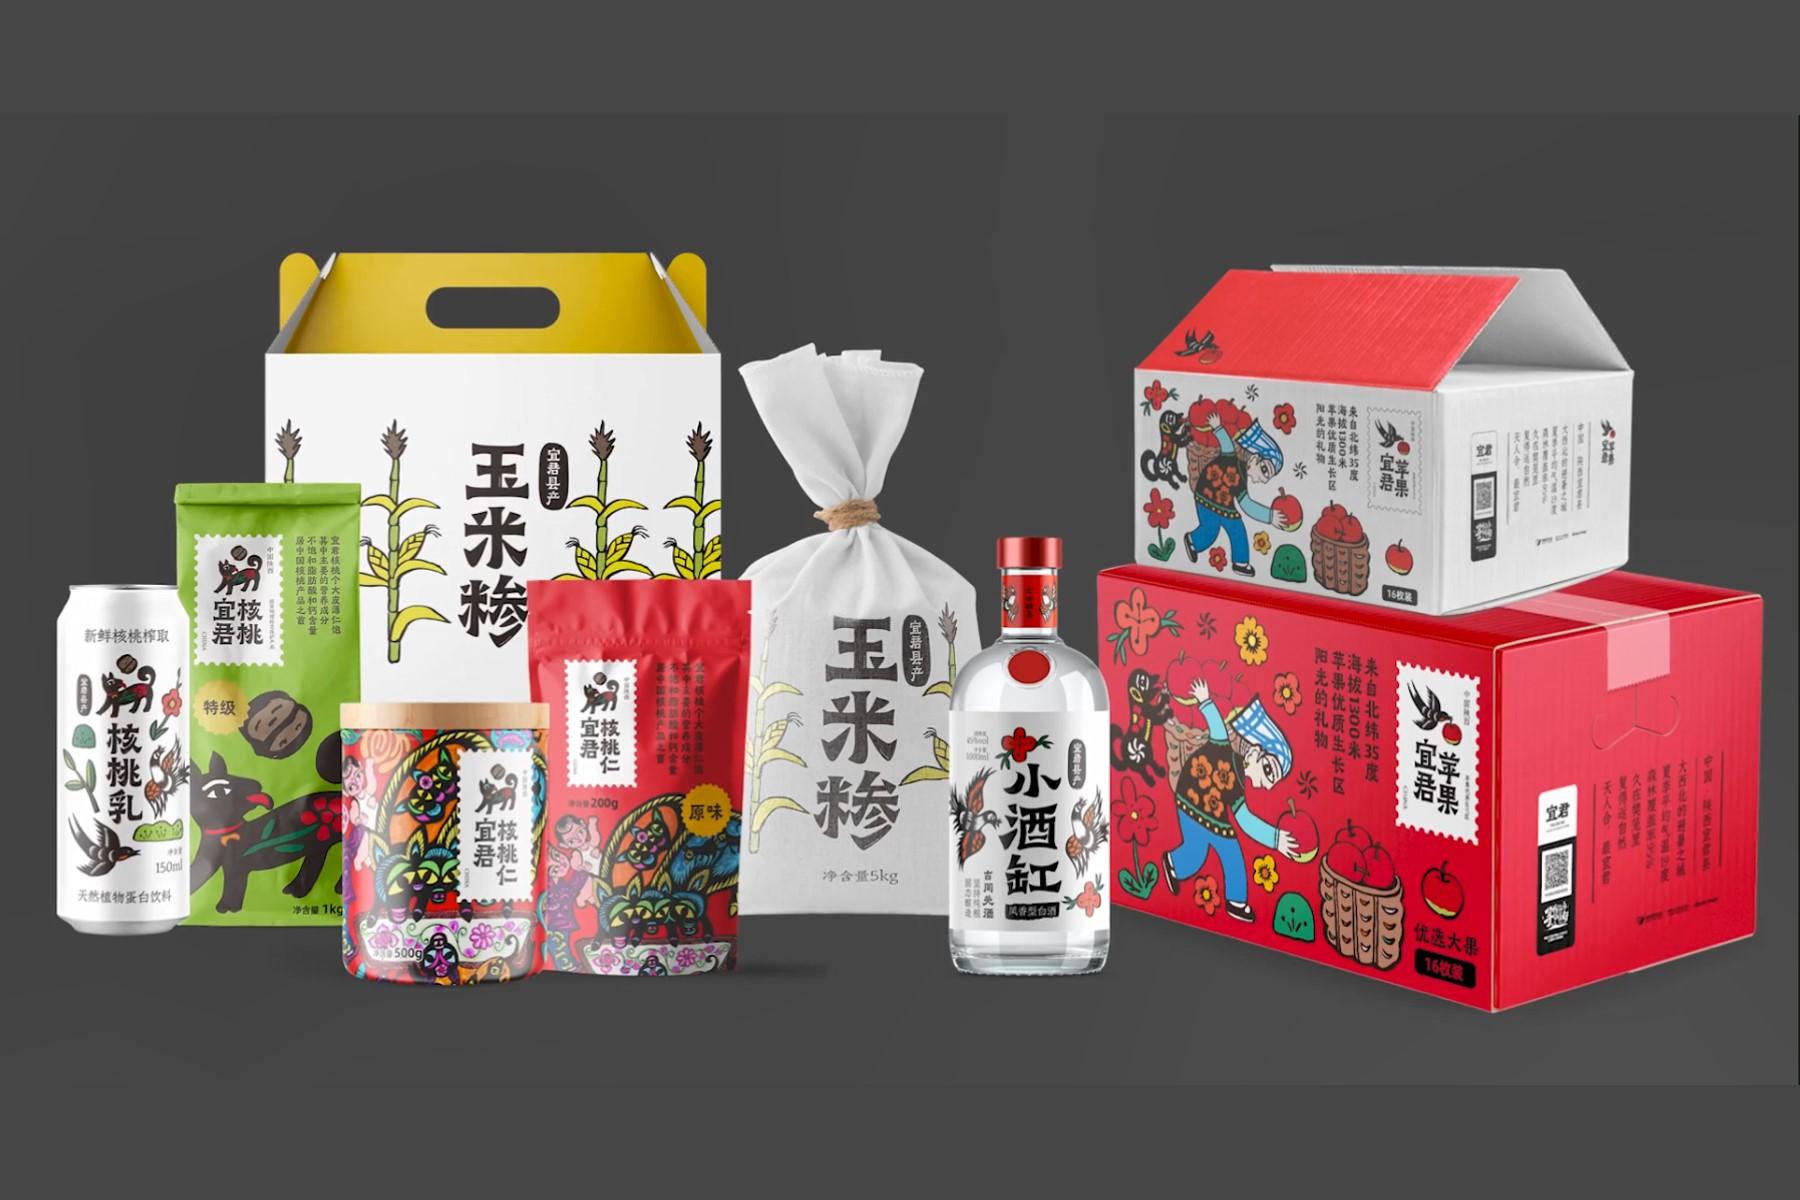 Alibaba-packaging-filantropi